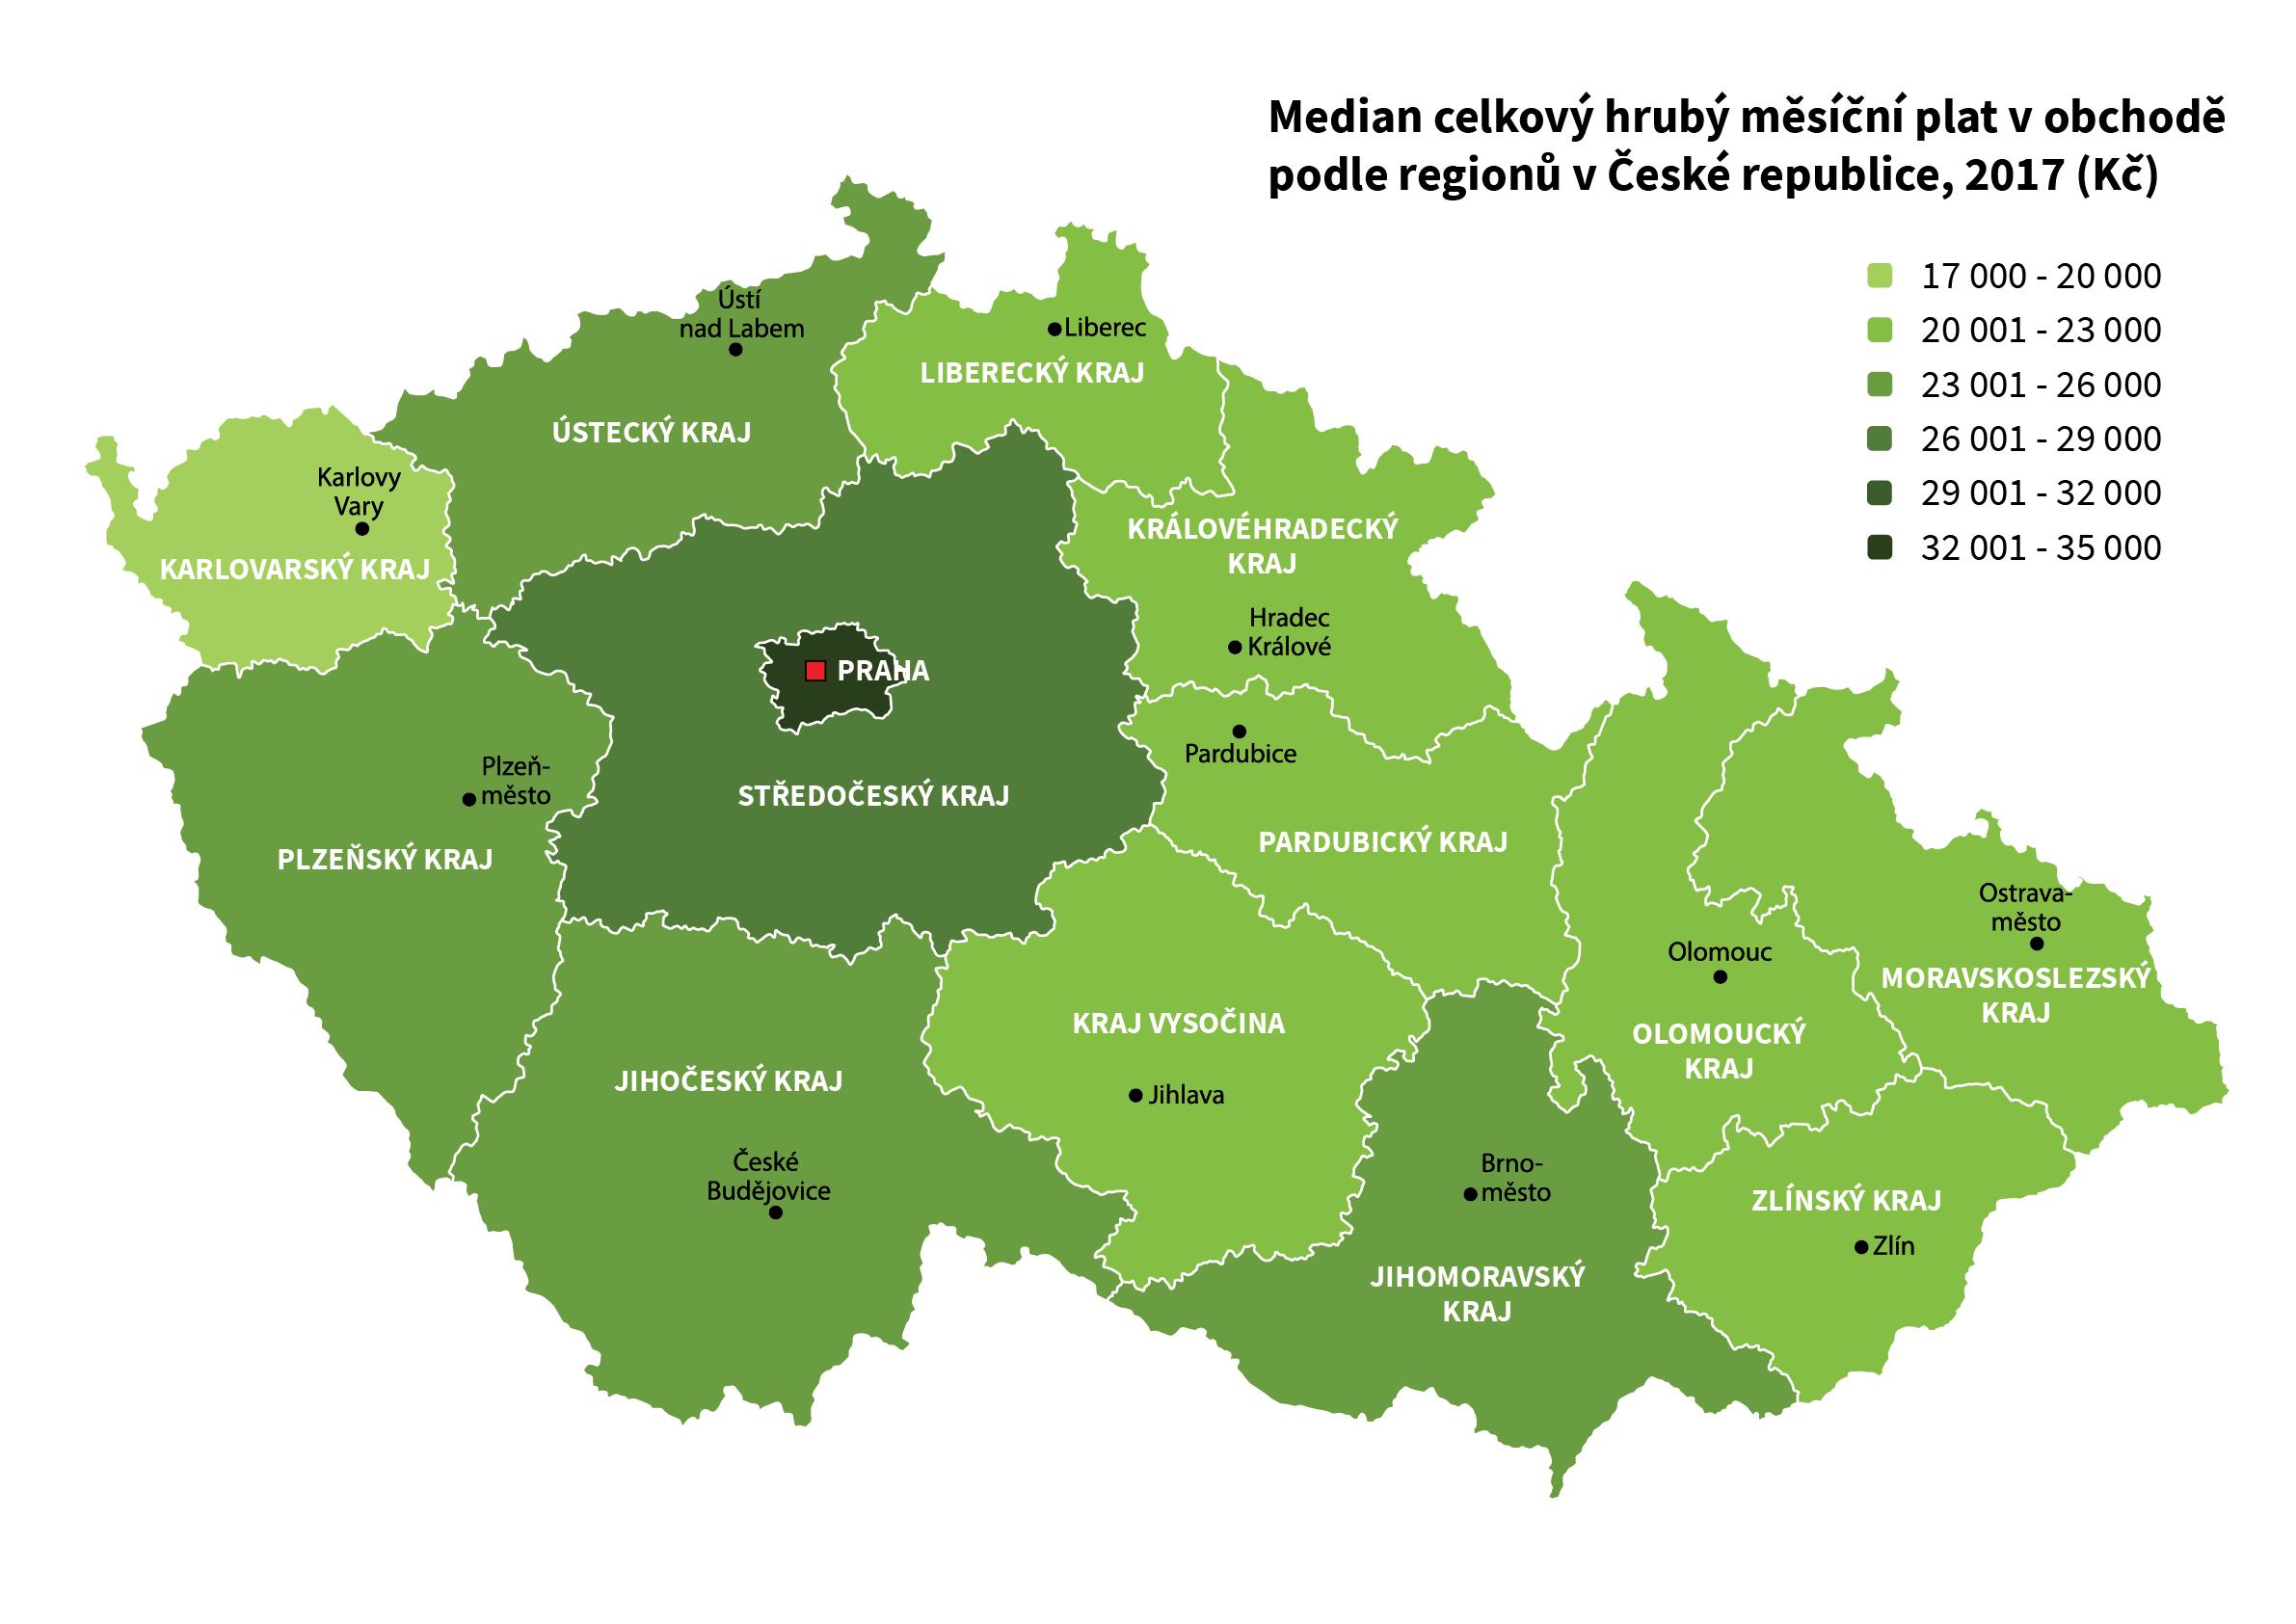 salary report regions retail obchod Ceska republika 2017